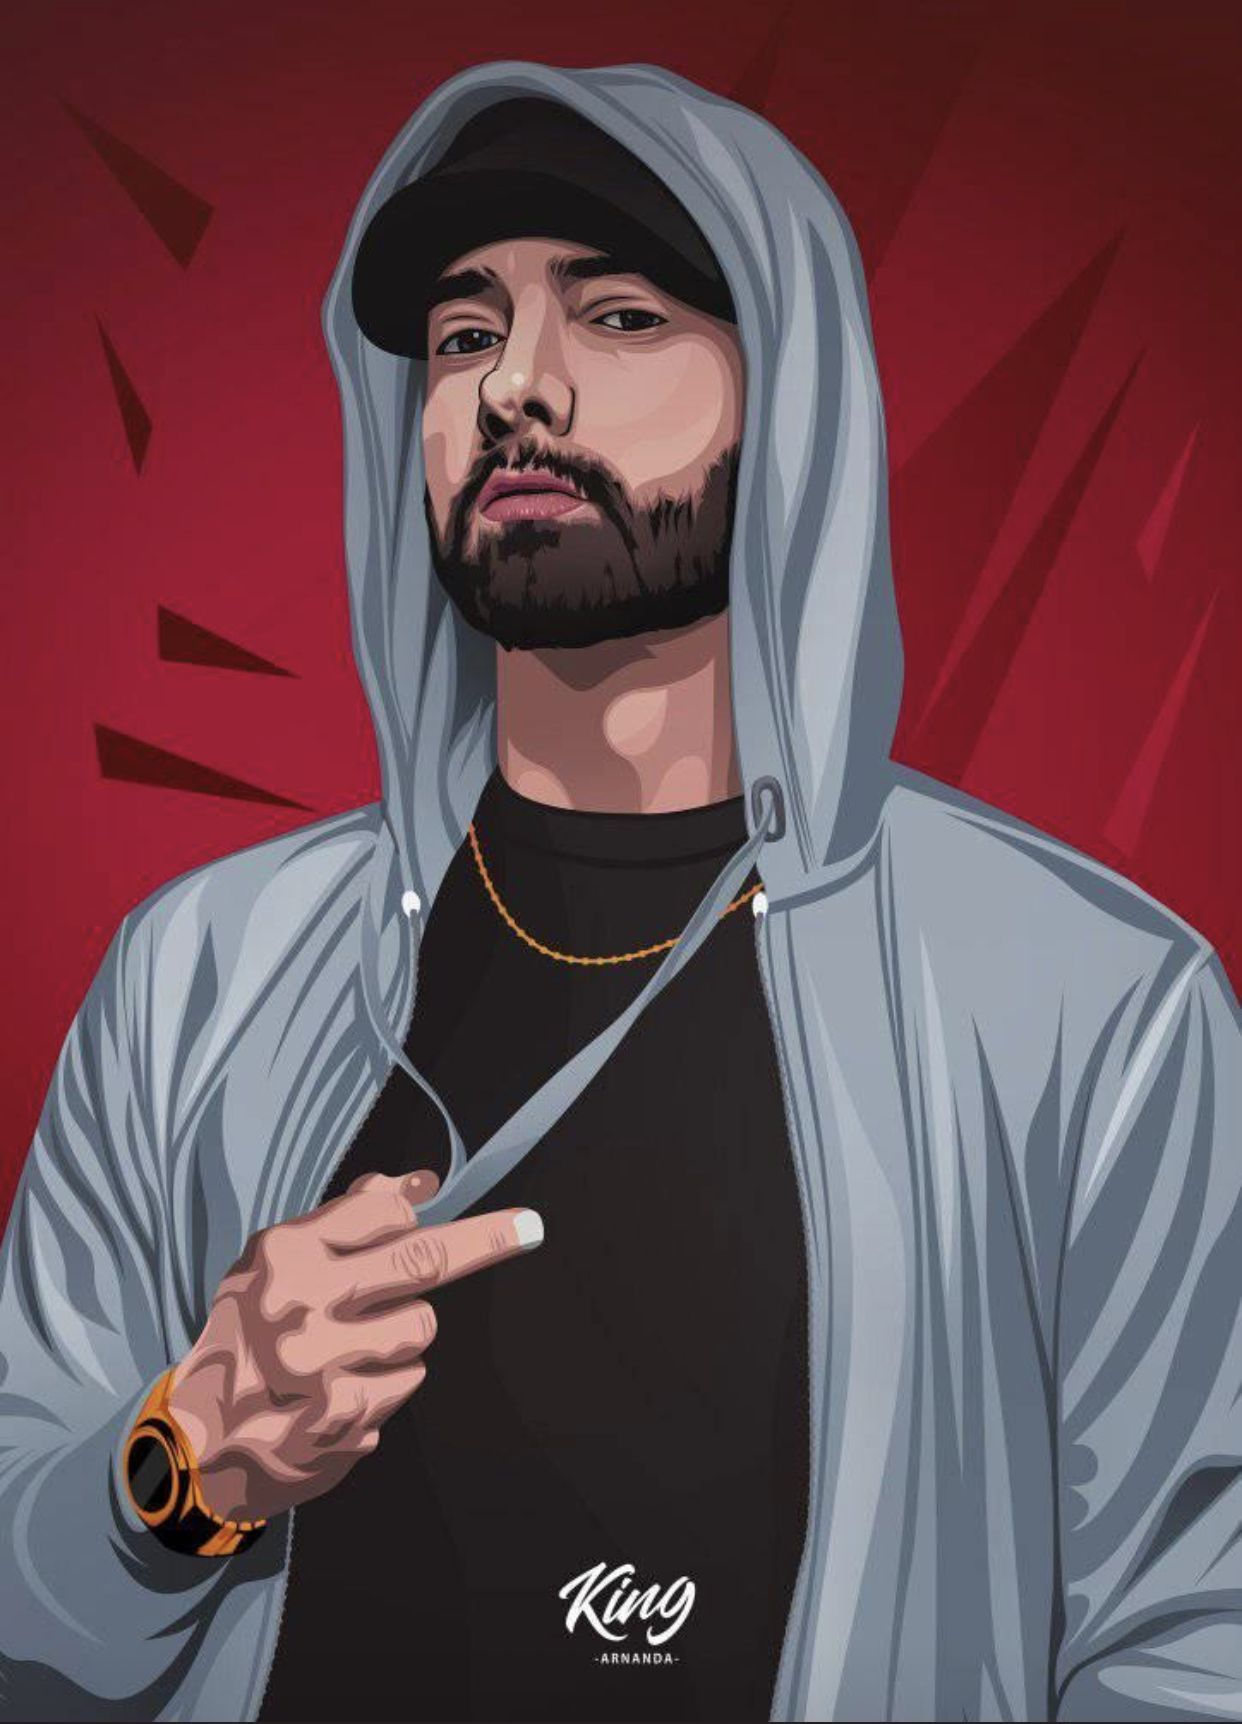 Eminem Cartoon Wallpapers Top Free Eminem Cartoon Backgrounds Wallpaperaccess